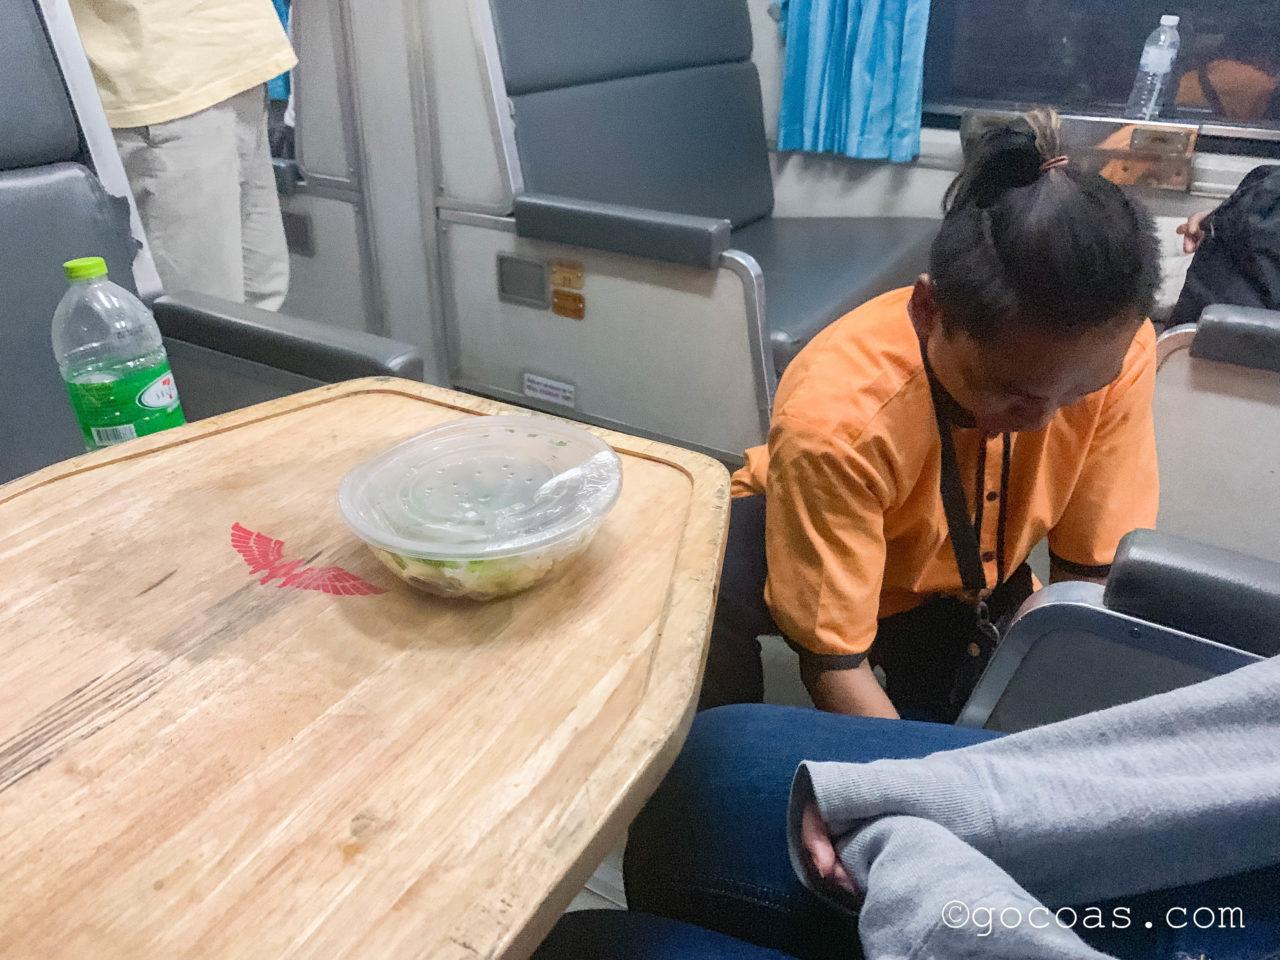 Hua Lamphong駅で乗った電車内の座席のテーブルに置かれる晩ごはん